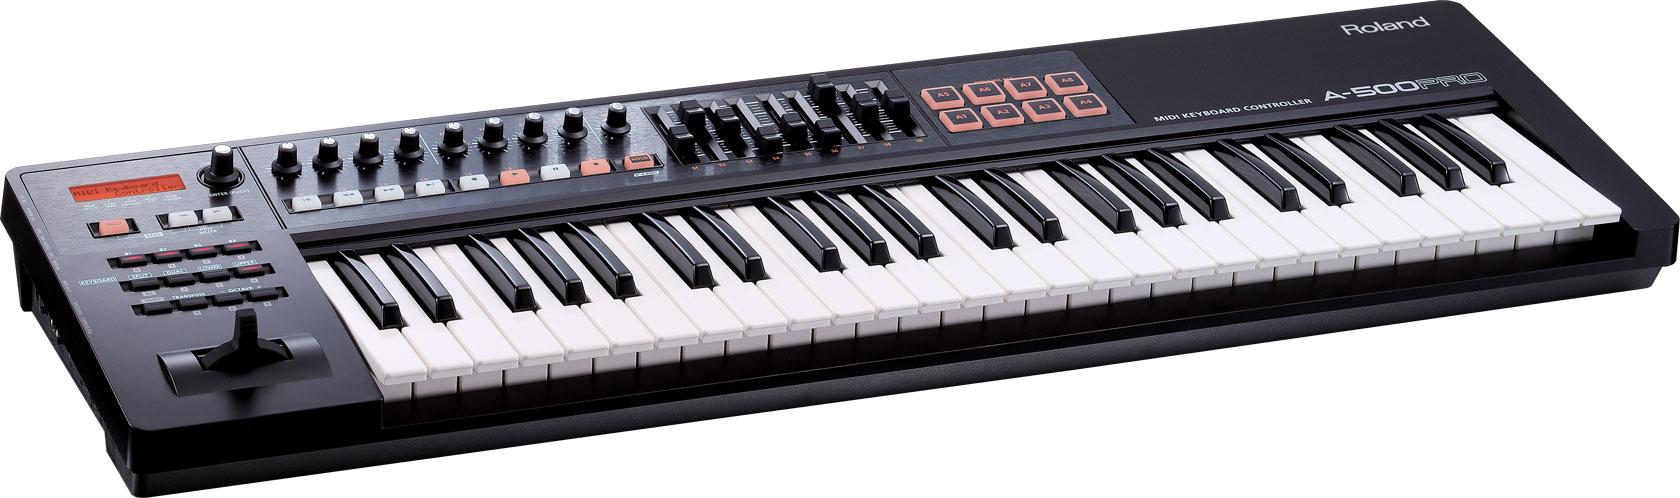 Roland A-500 PRO 主控鍵盤